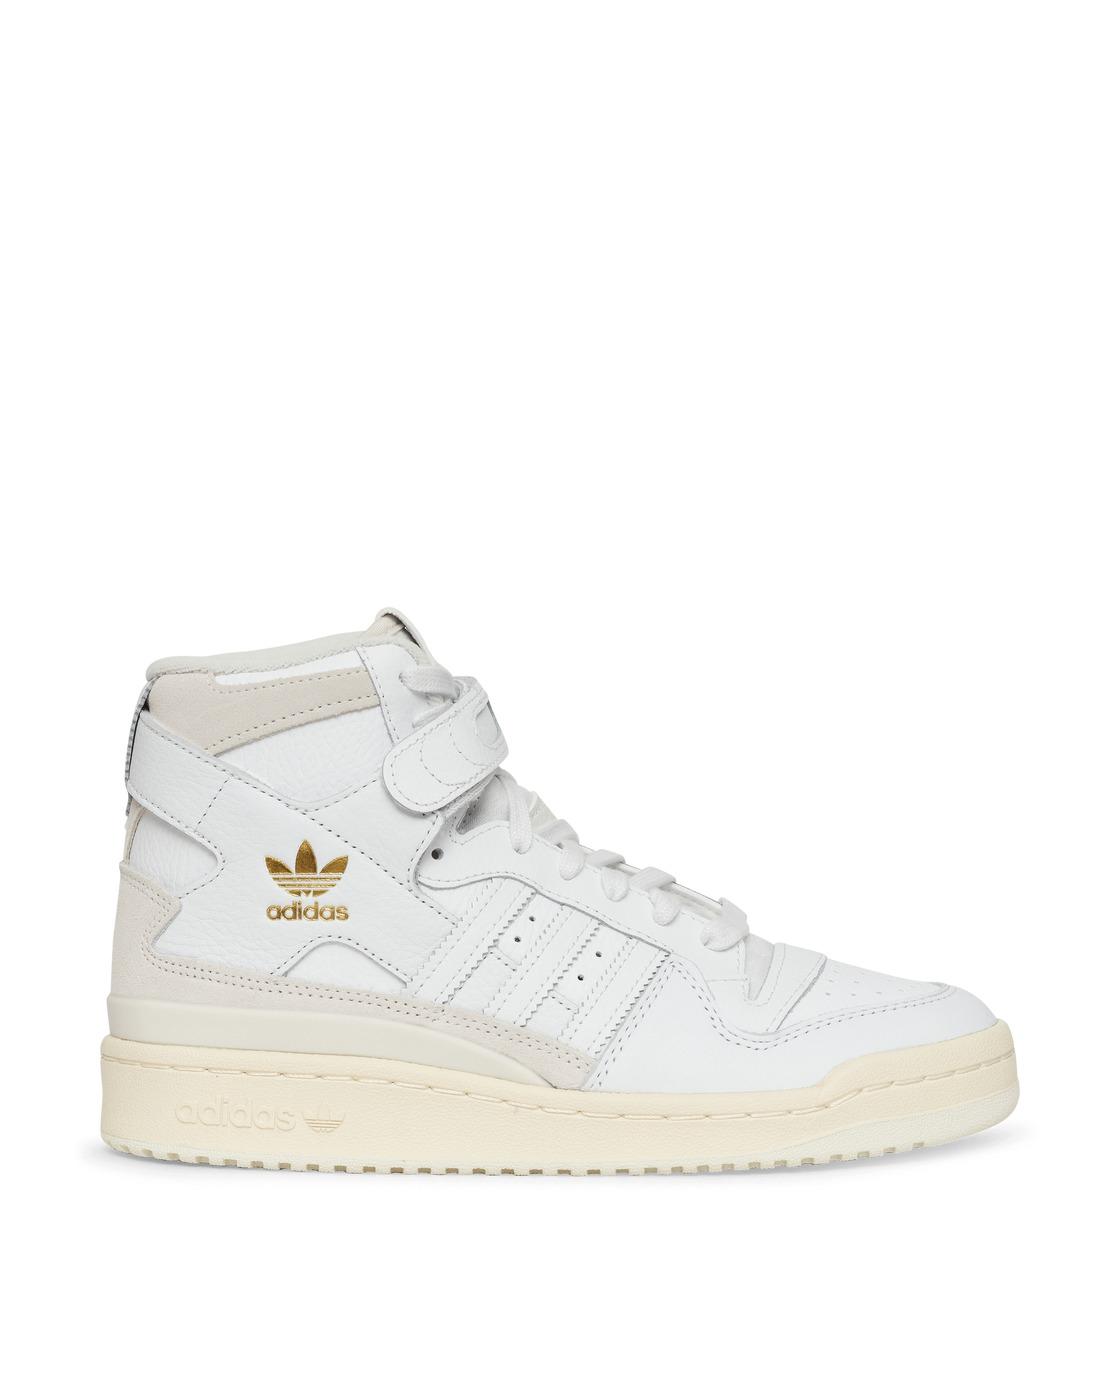 Photo: Adidas Originals Forum 84 High Sneakers Ftwr White 38